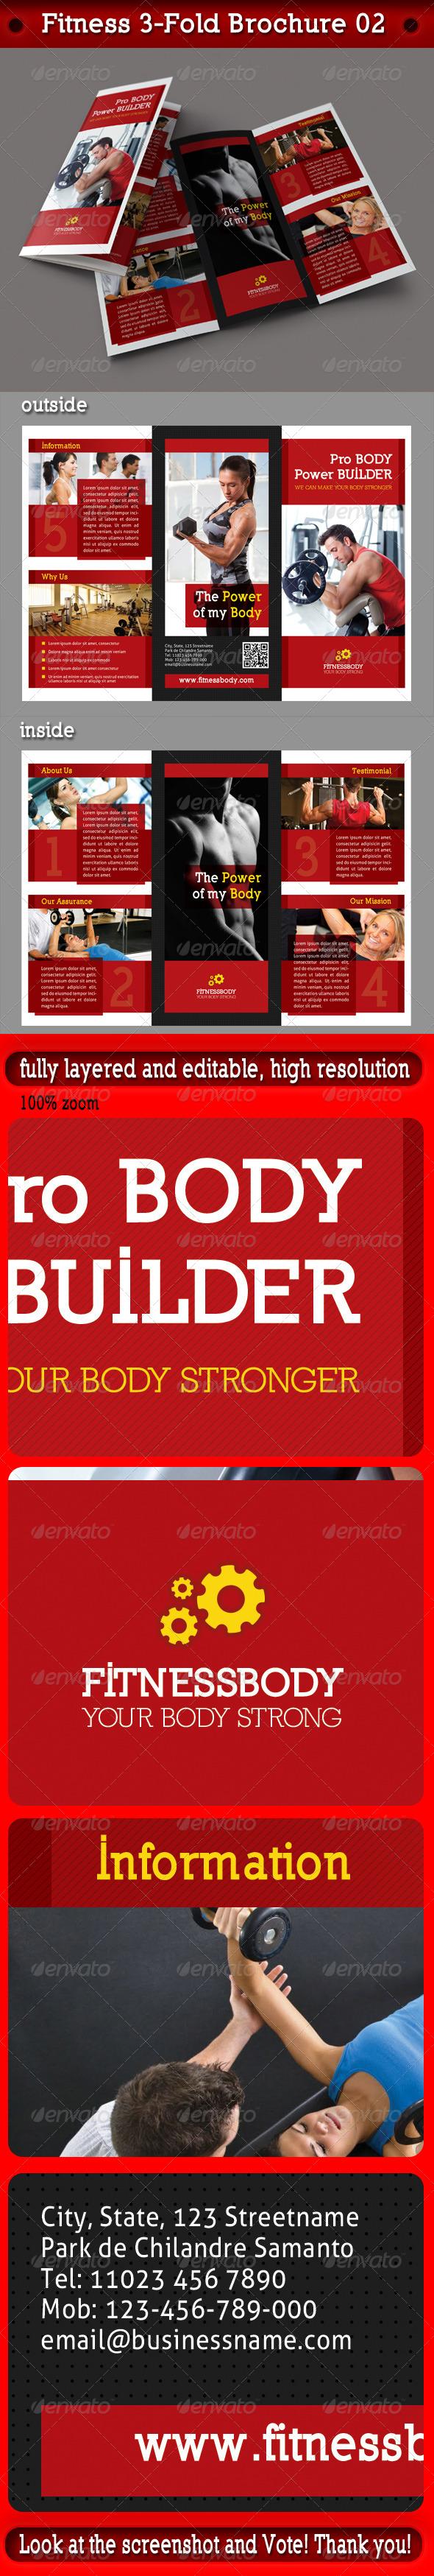 Fitness 3-Fold Brochure 02